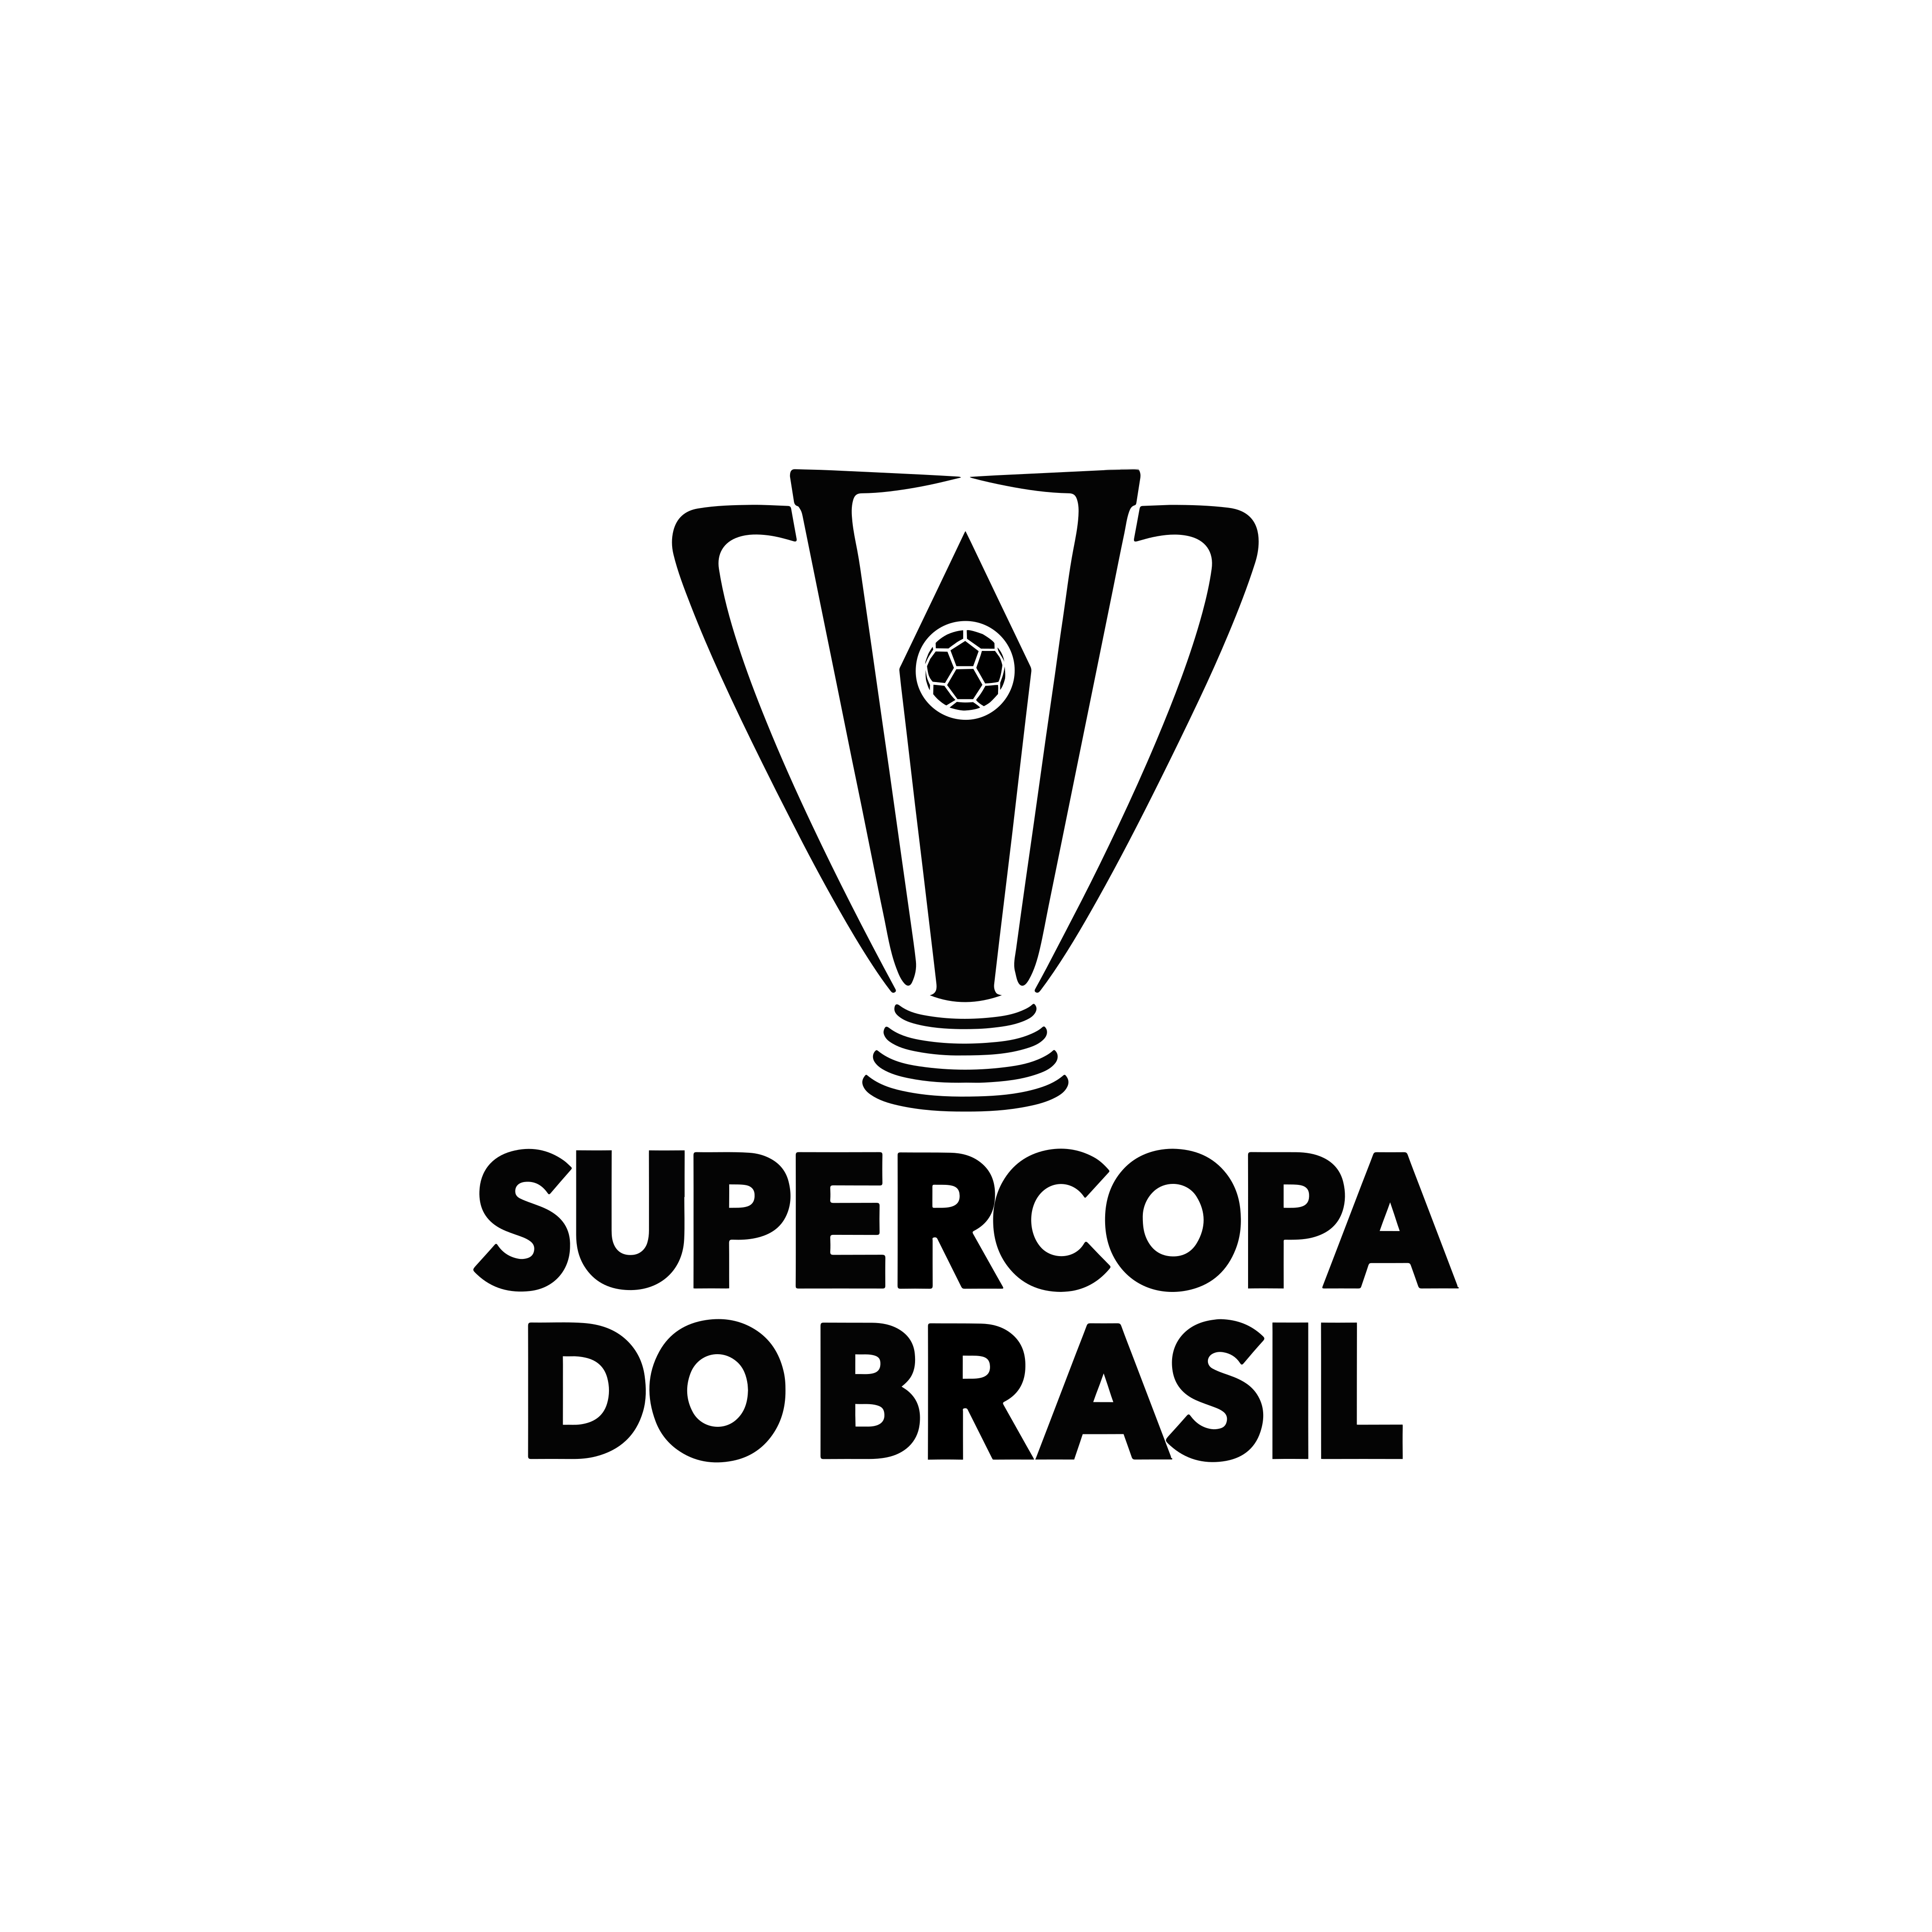 supercopa do brasil logo 0 - Supercopa Do Brasil Logo